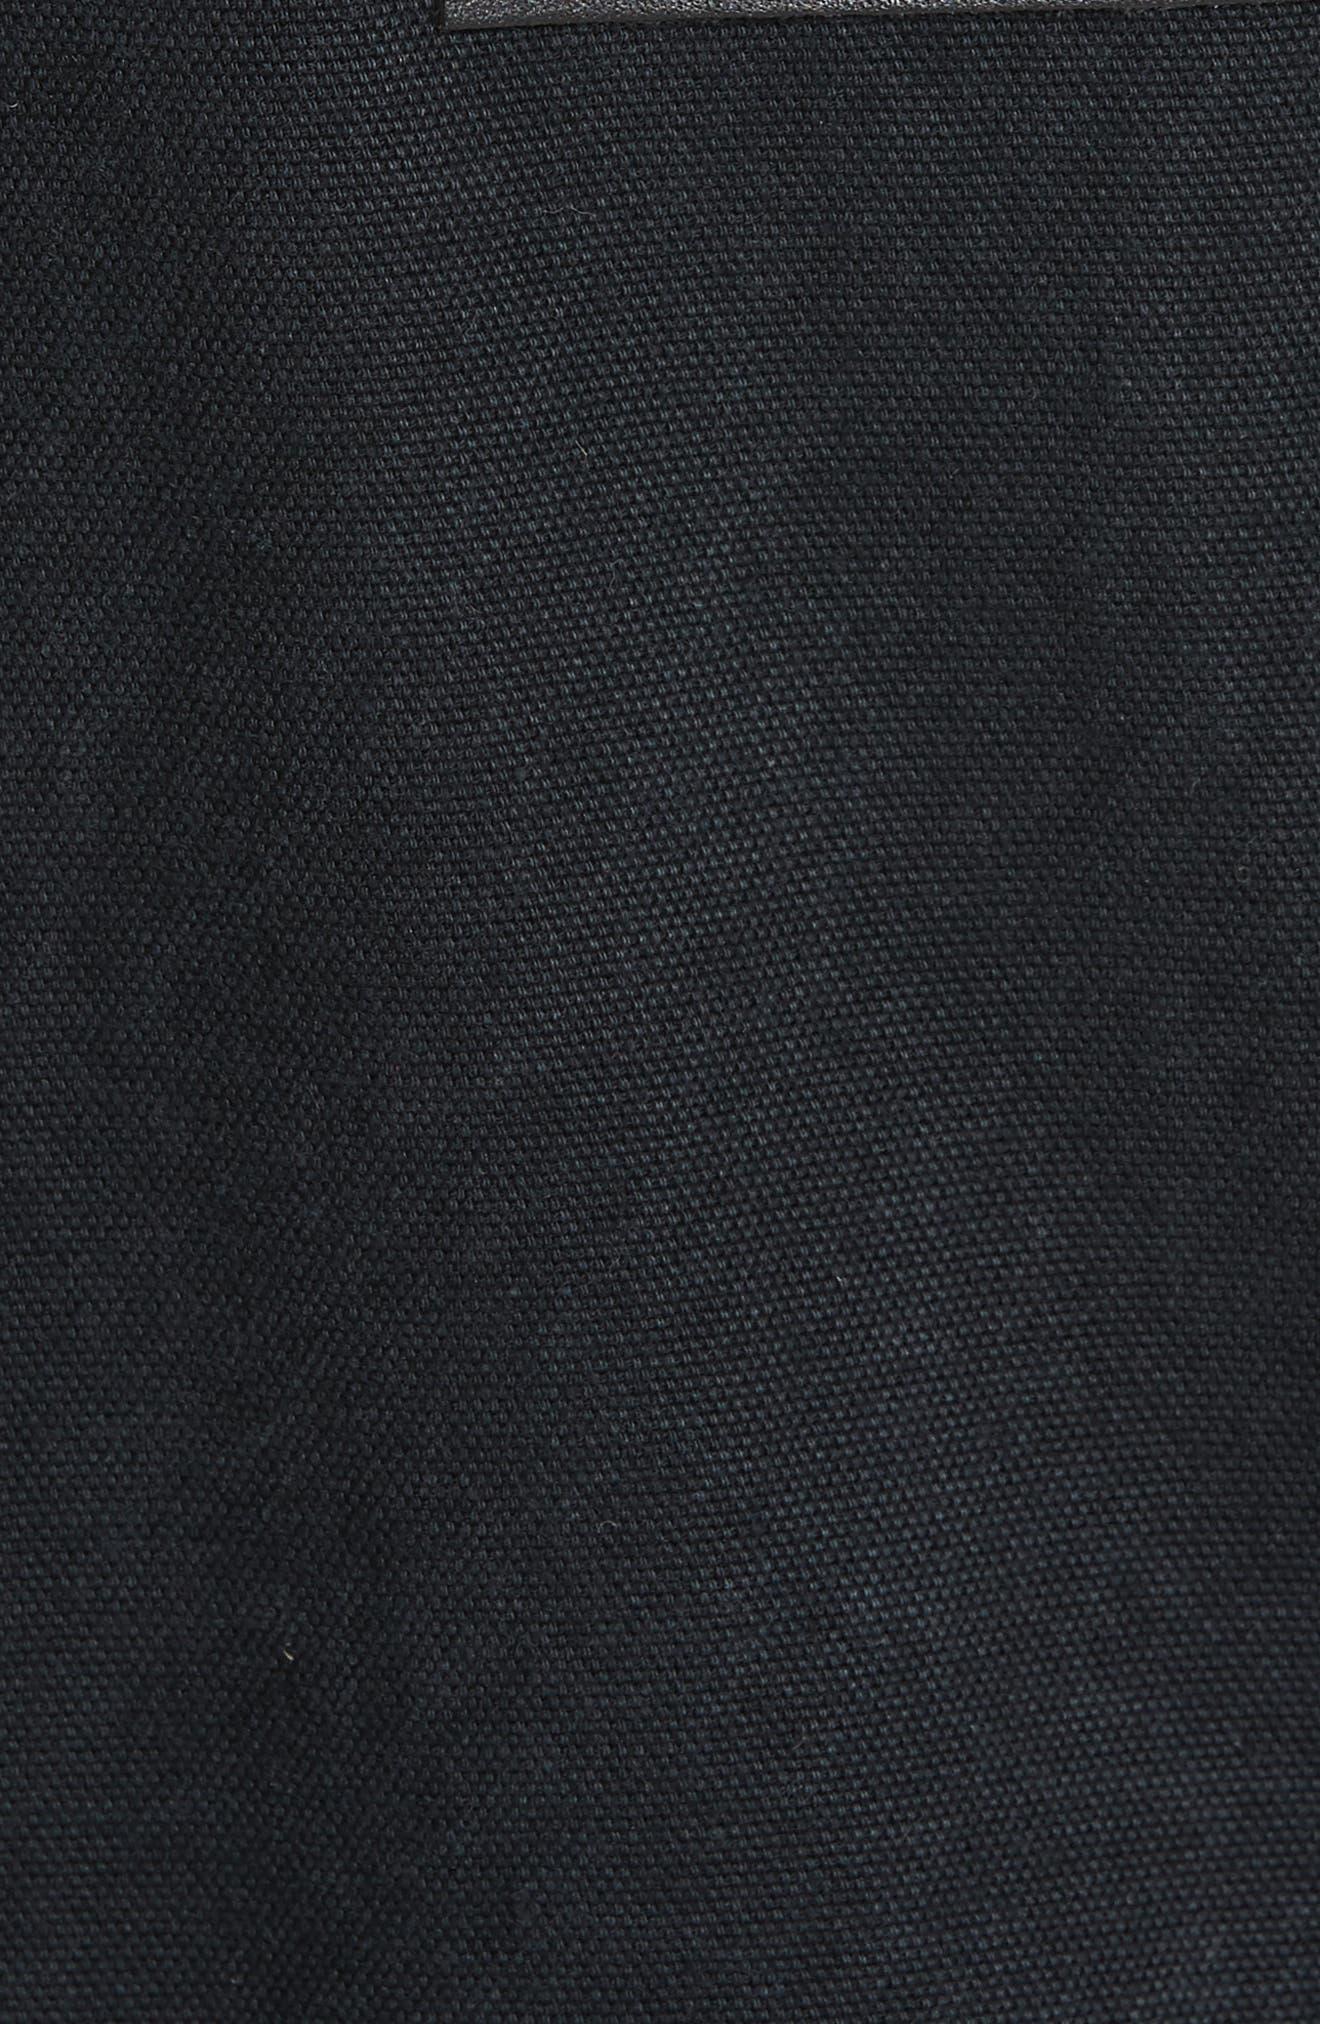 Imitation Pearl Embellished Overalls,                             Alternate thumbnail 5, color,                             001